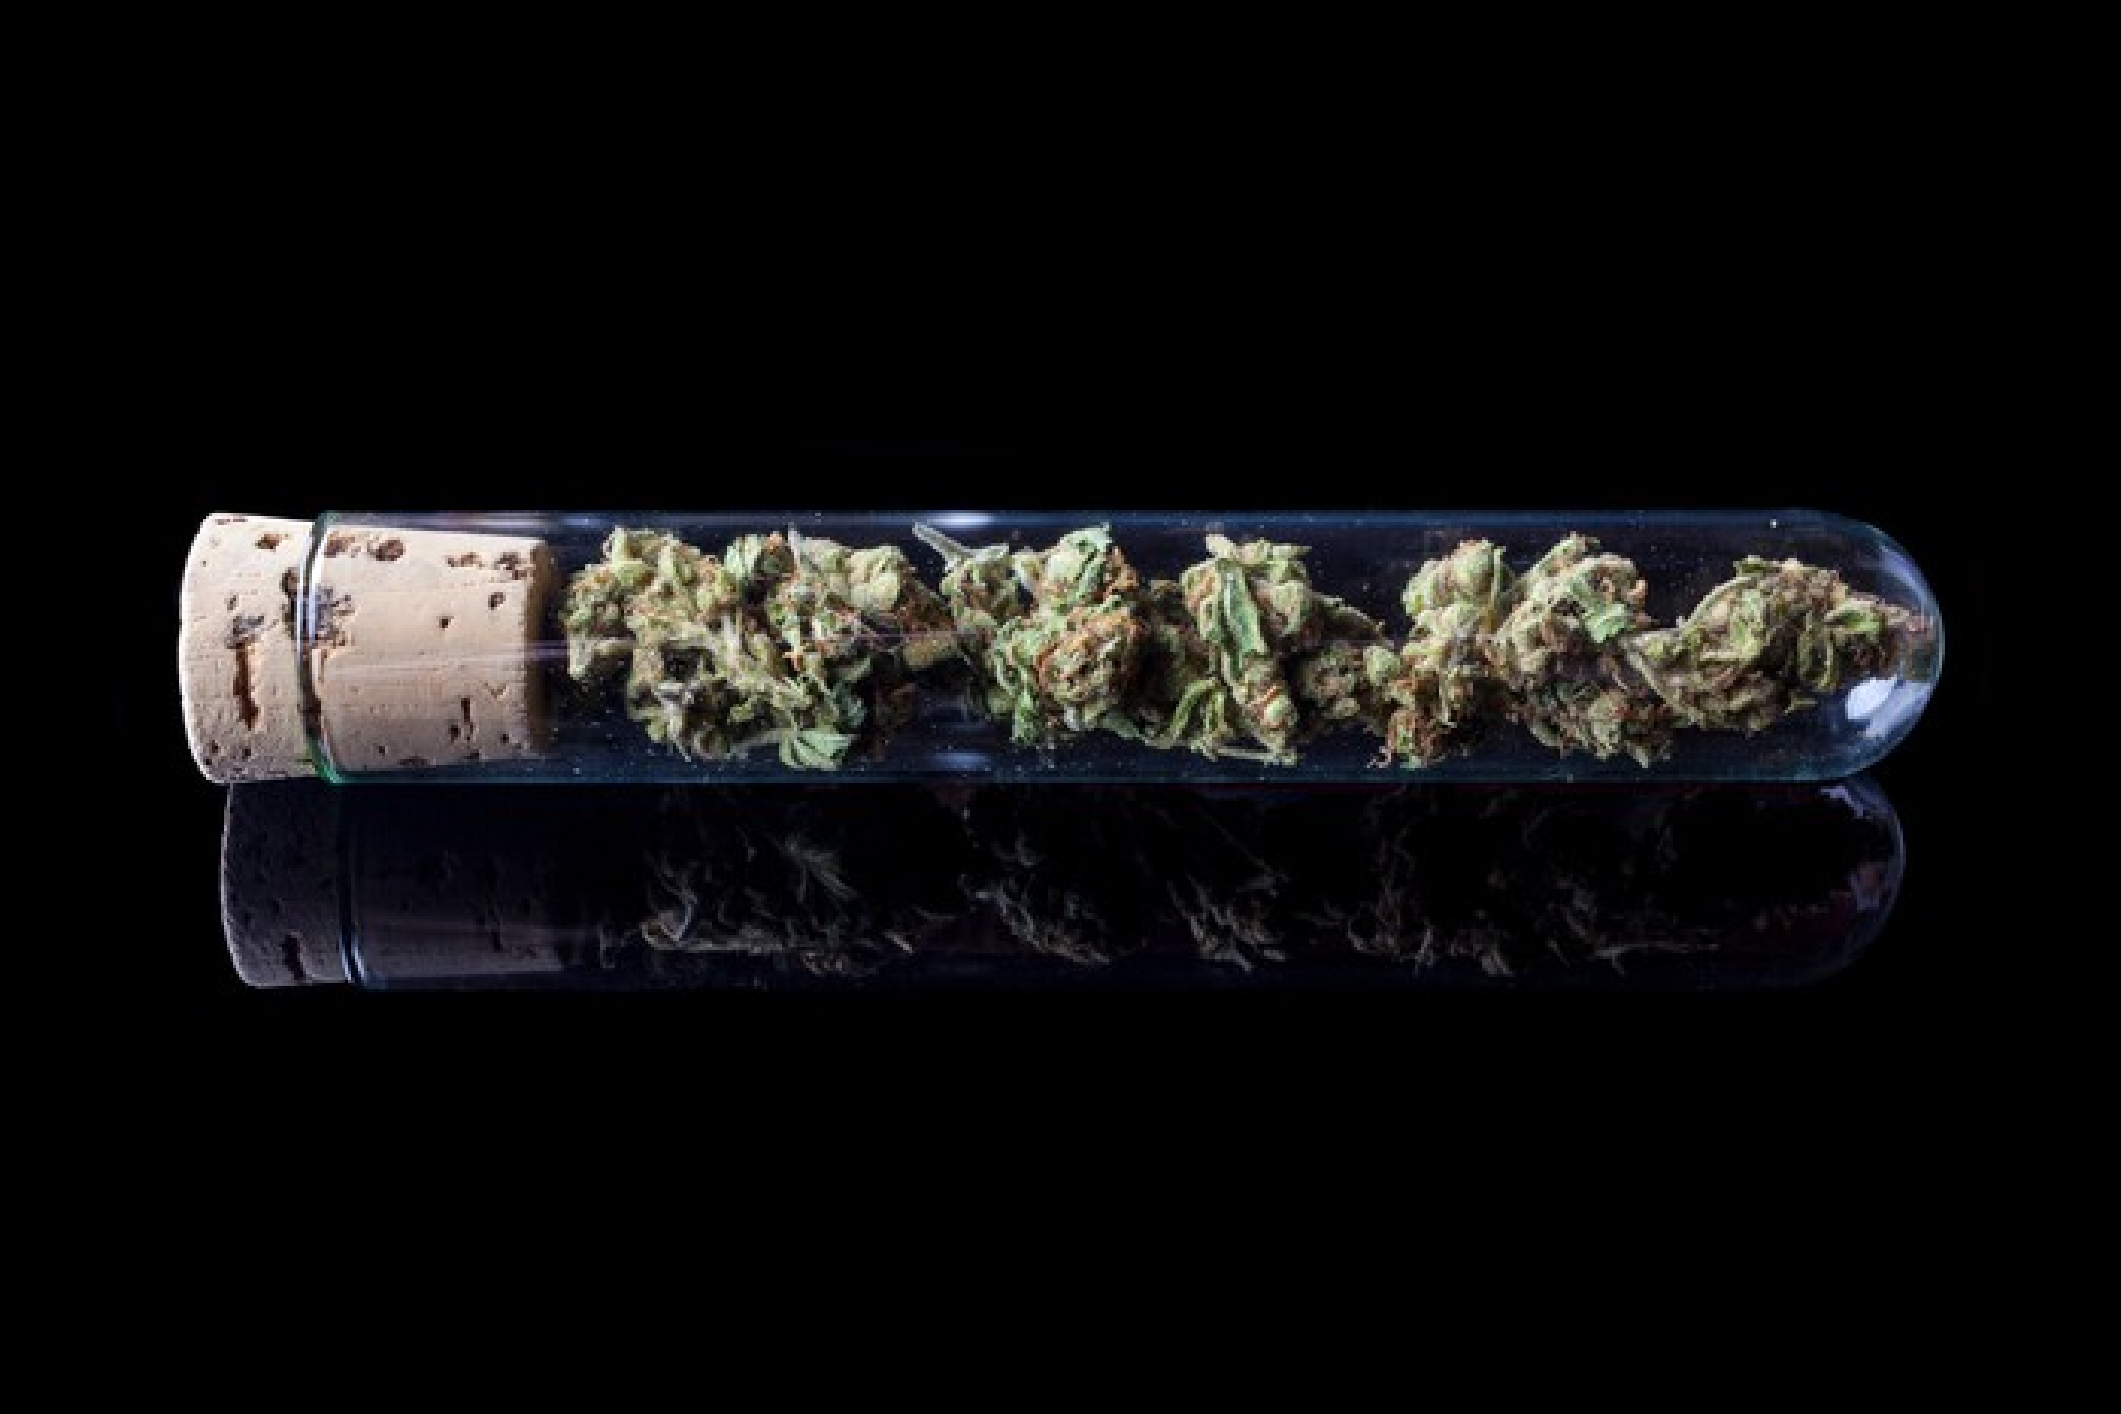 Marijuana buds in test tube